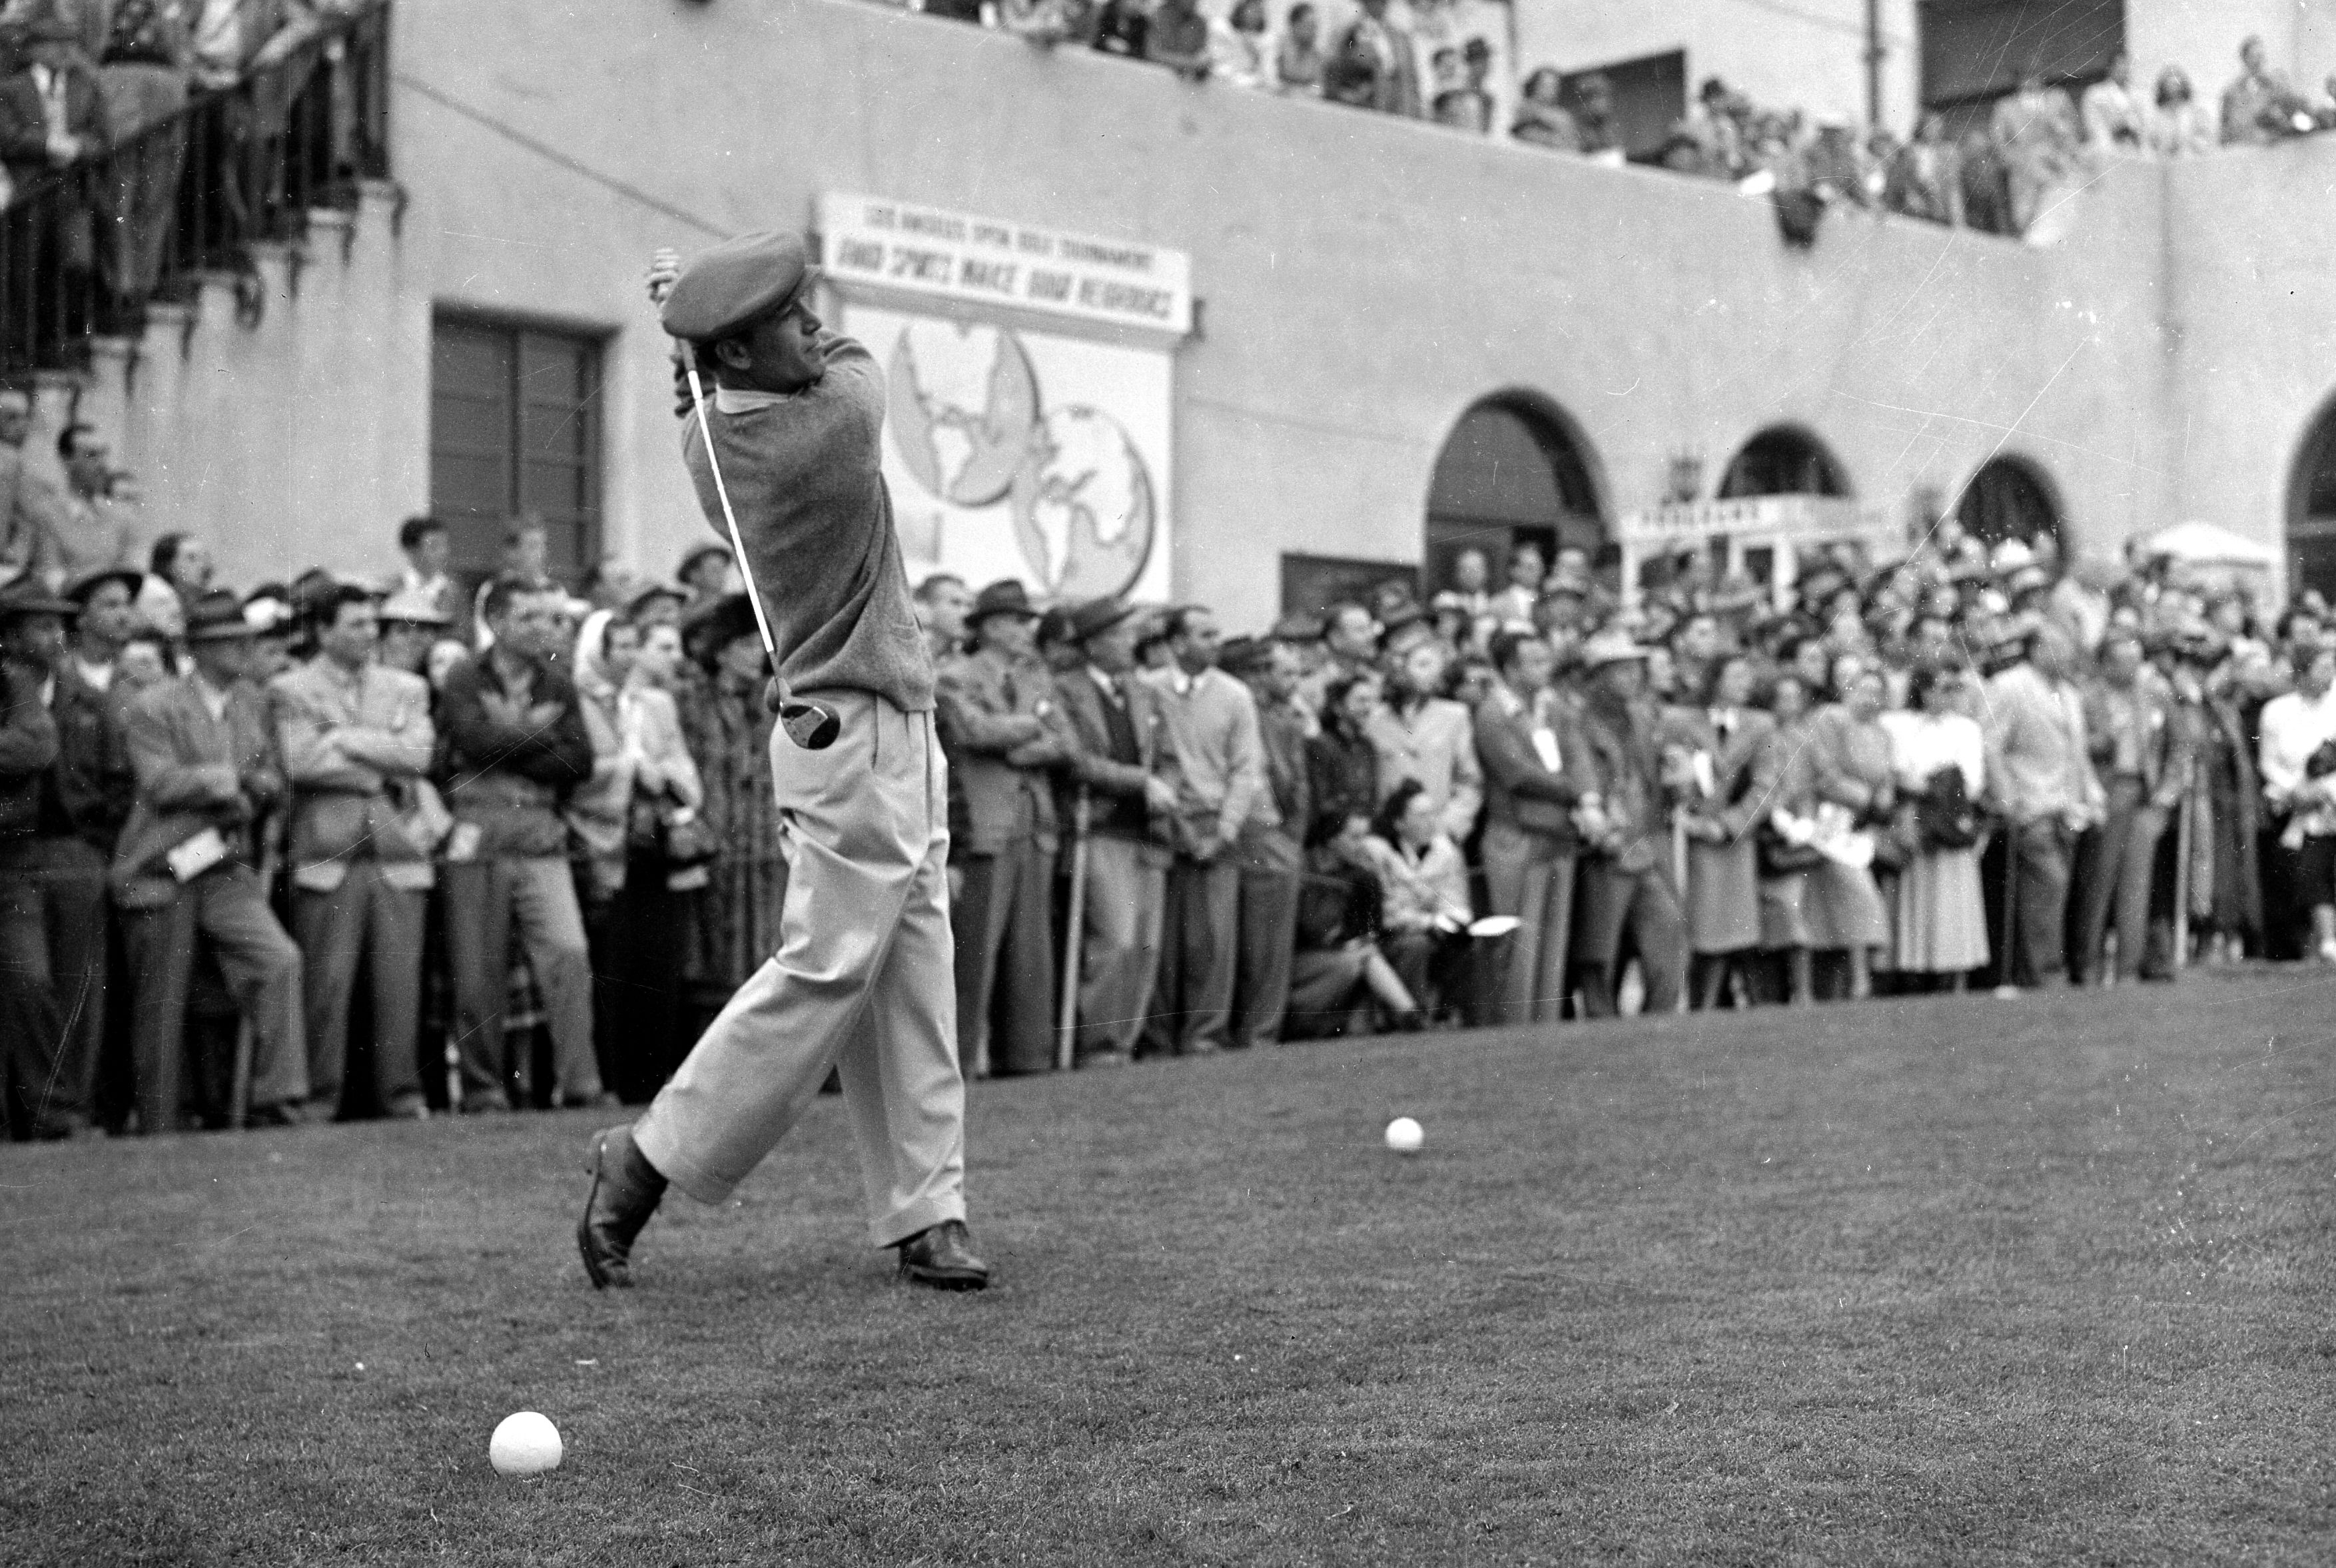 Ben Hogan hits a drive at the 1948 Hershey Open